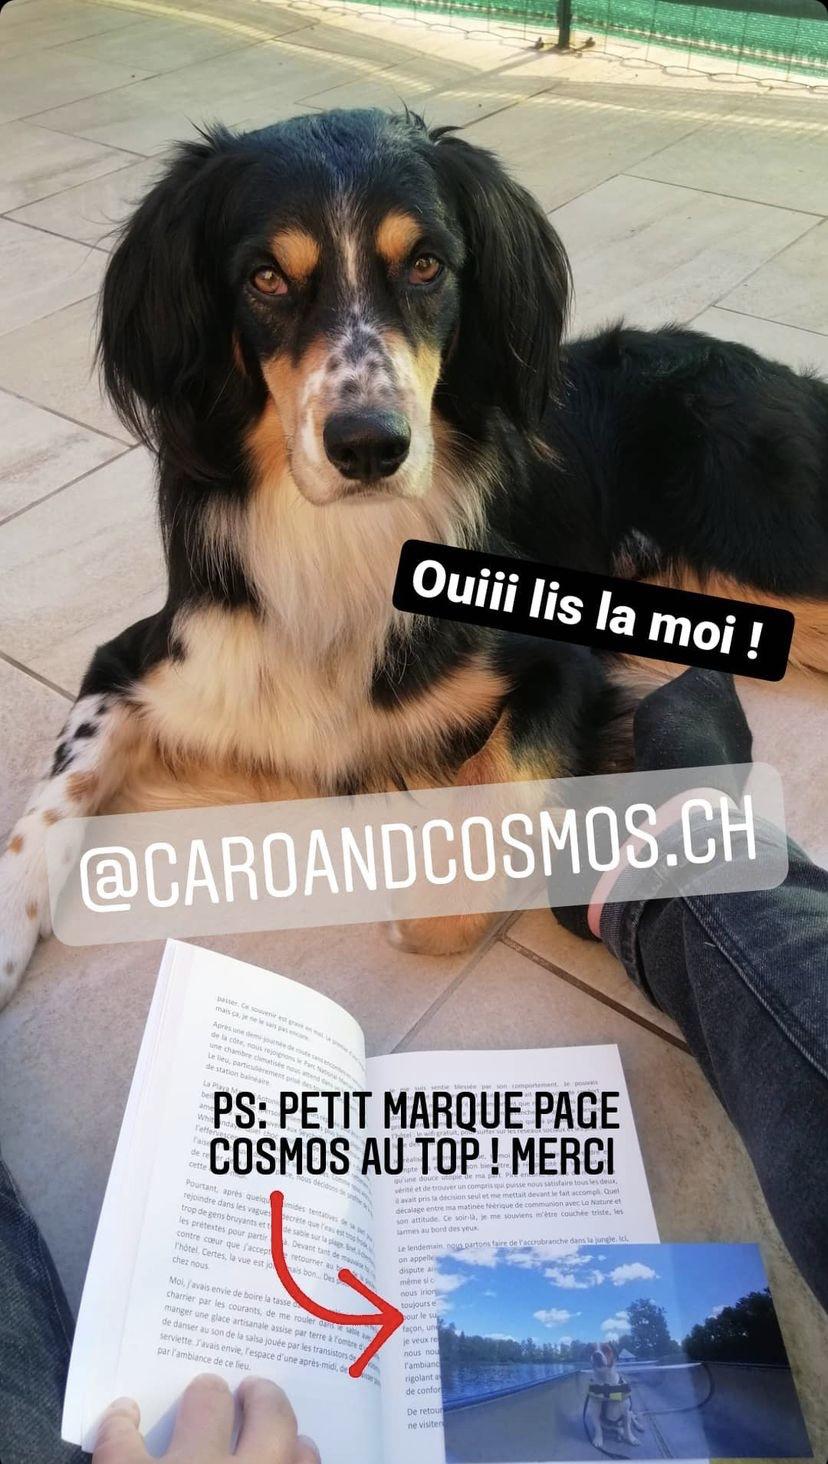 mon chien s'appelle Cosmos